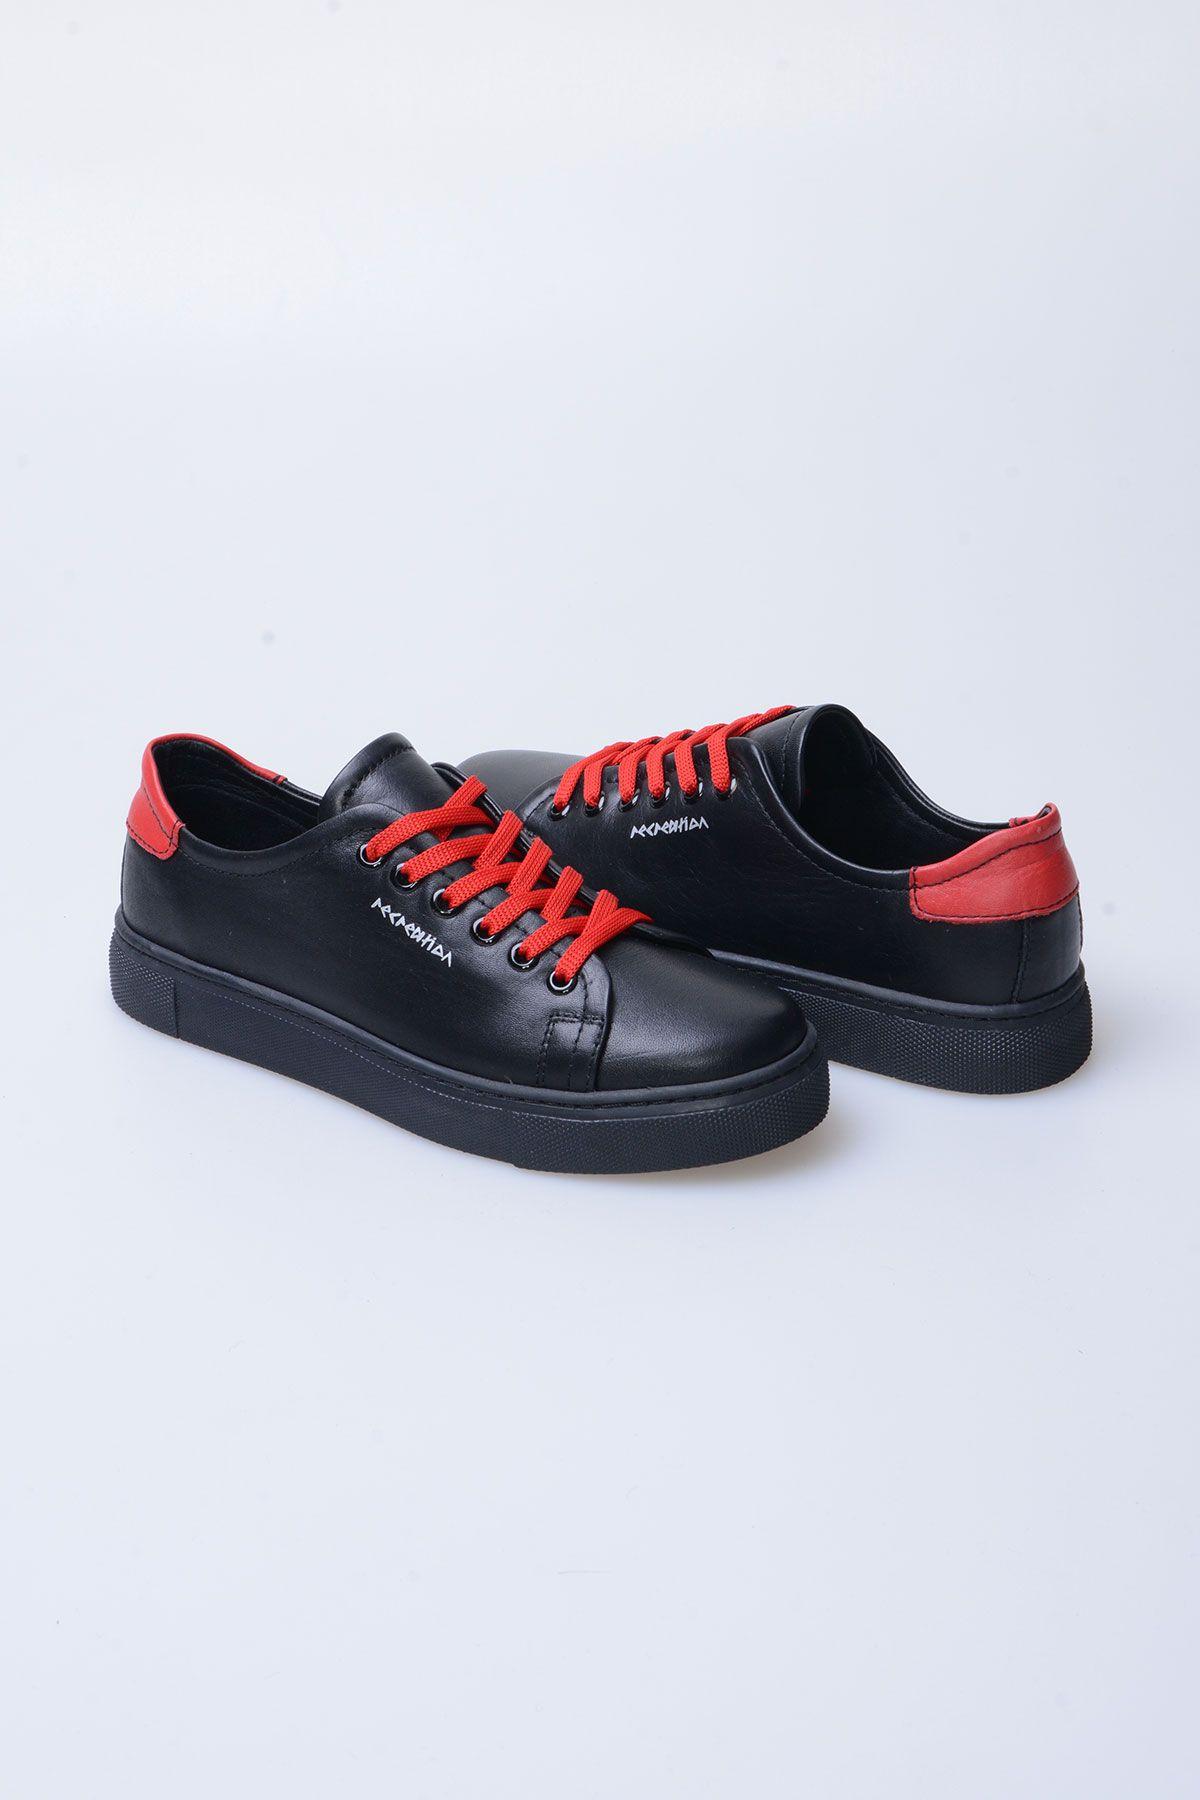 Pegia Recreation Hakiki Deri Bayan Sneaker 19REC201 Siyah/Kırmızı